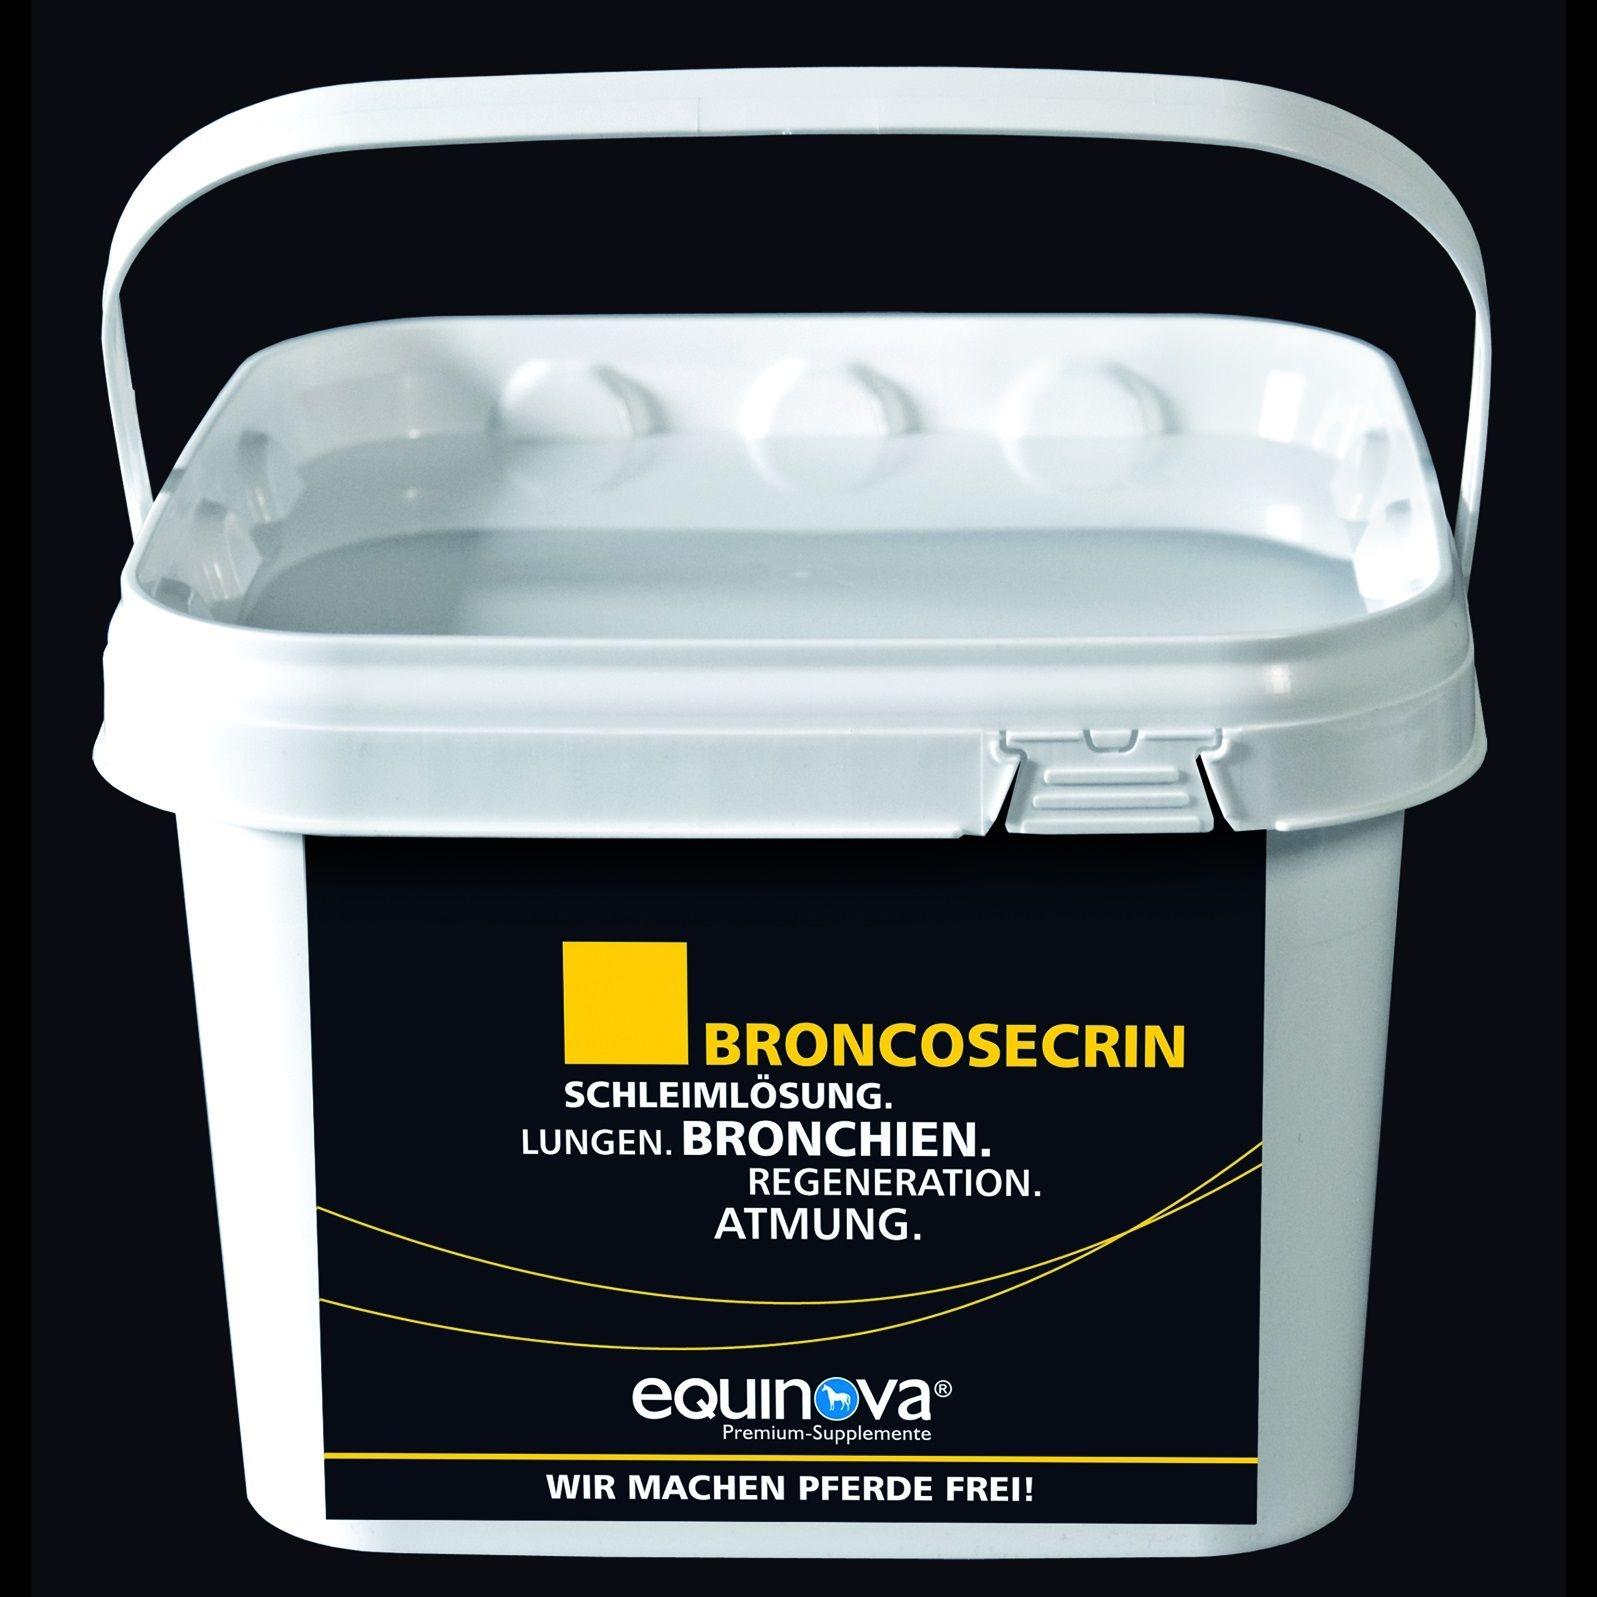 Equinova Broncosecrin Powder 500g